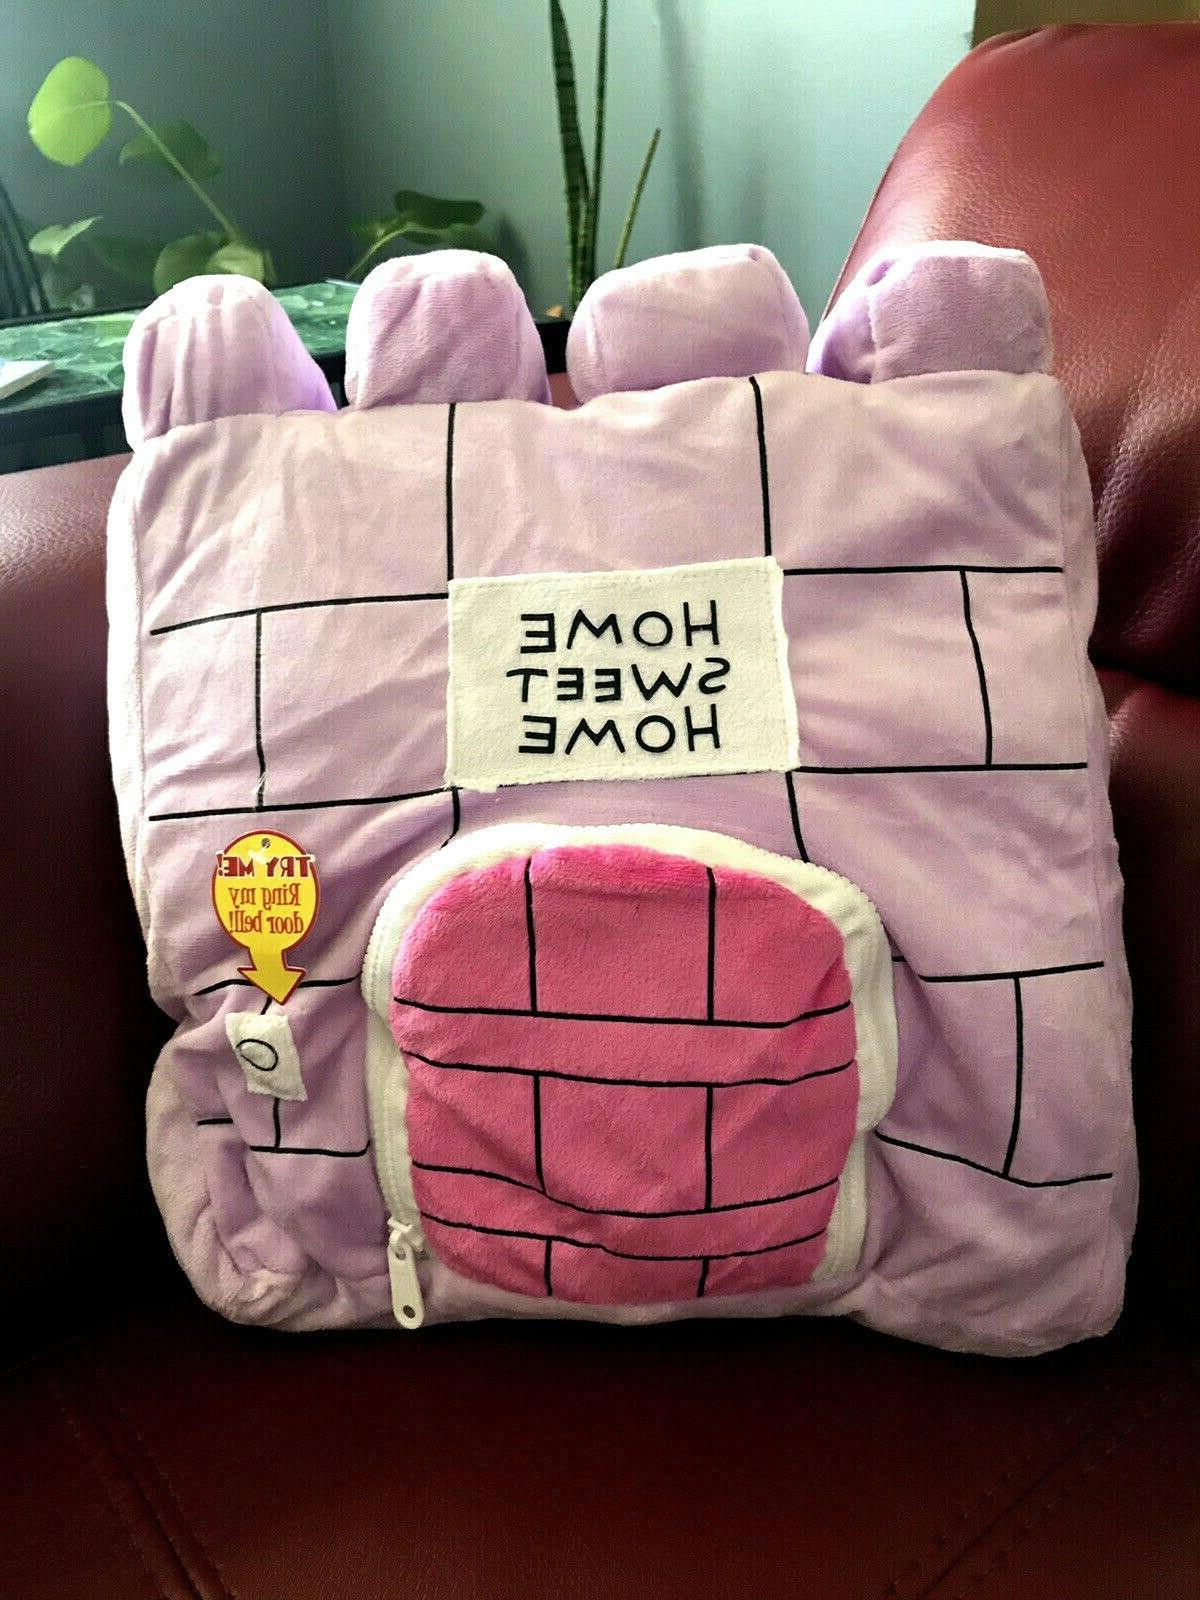 "24"" Funny Plush Fantasy Soft Pillow"